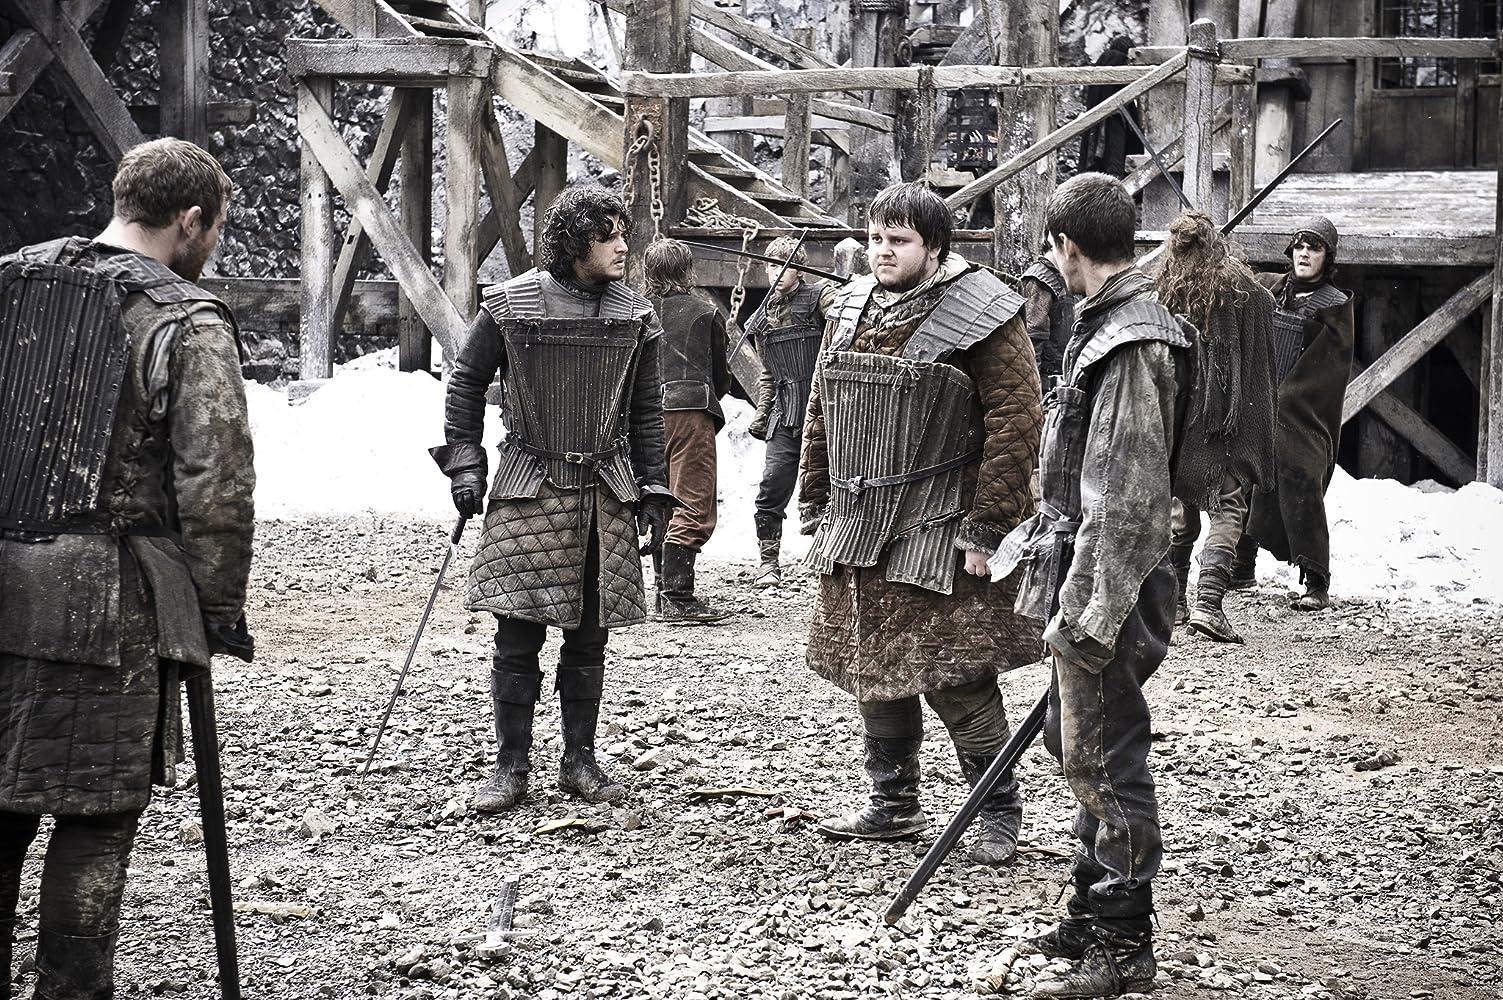 Josef Altin, Kit Harington, John Bradley, and Mark Stanley in Game of Thrones (2011)